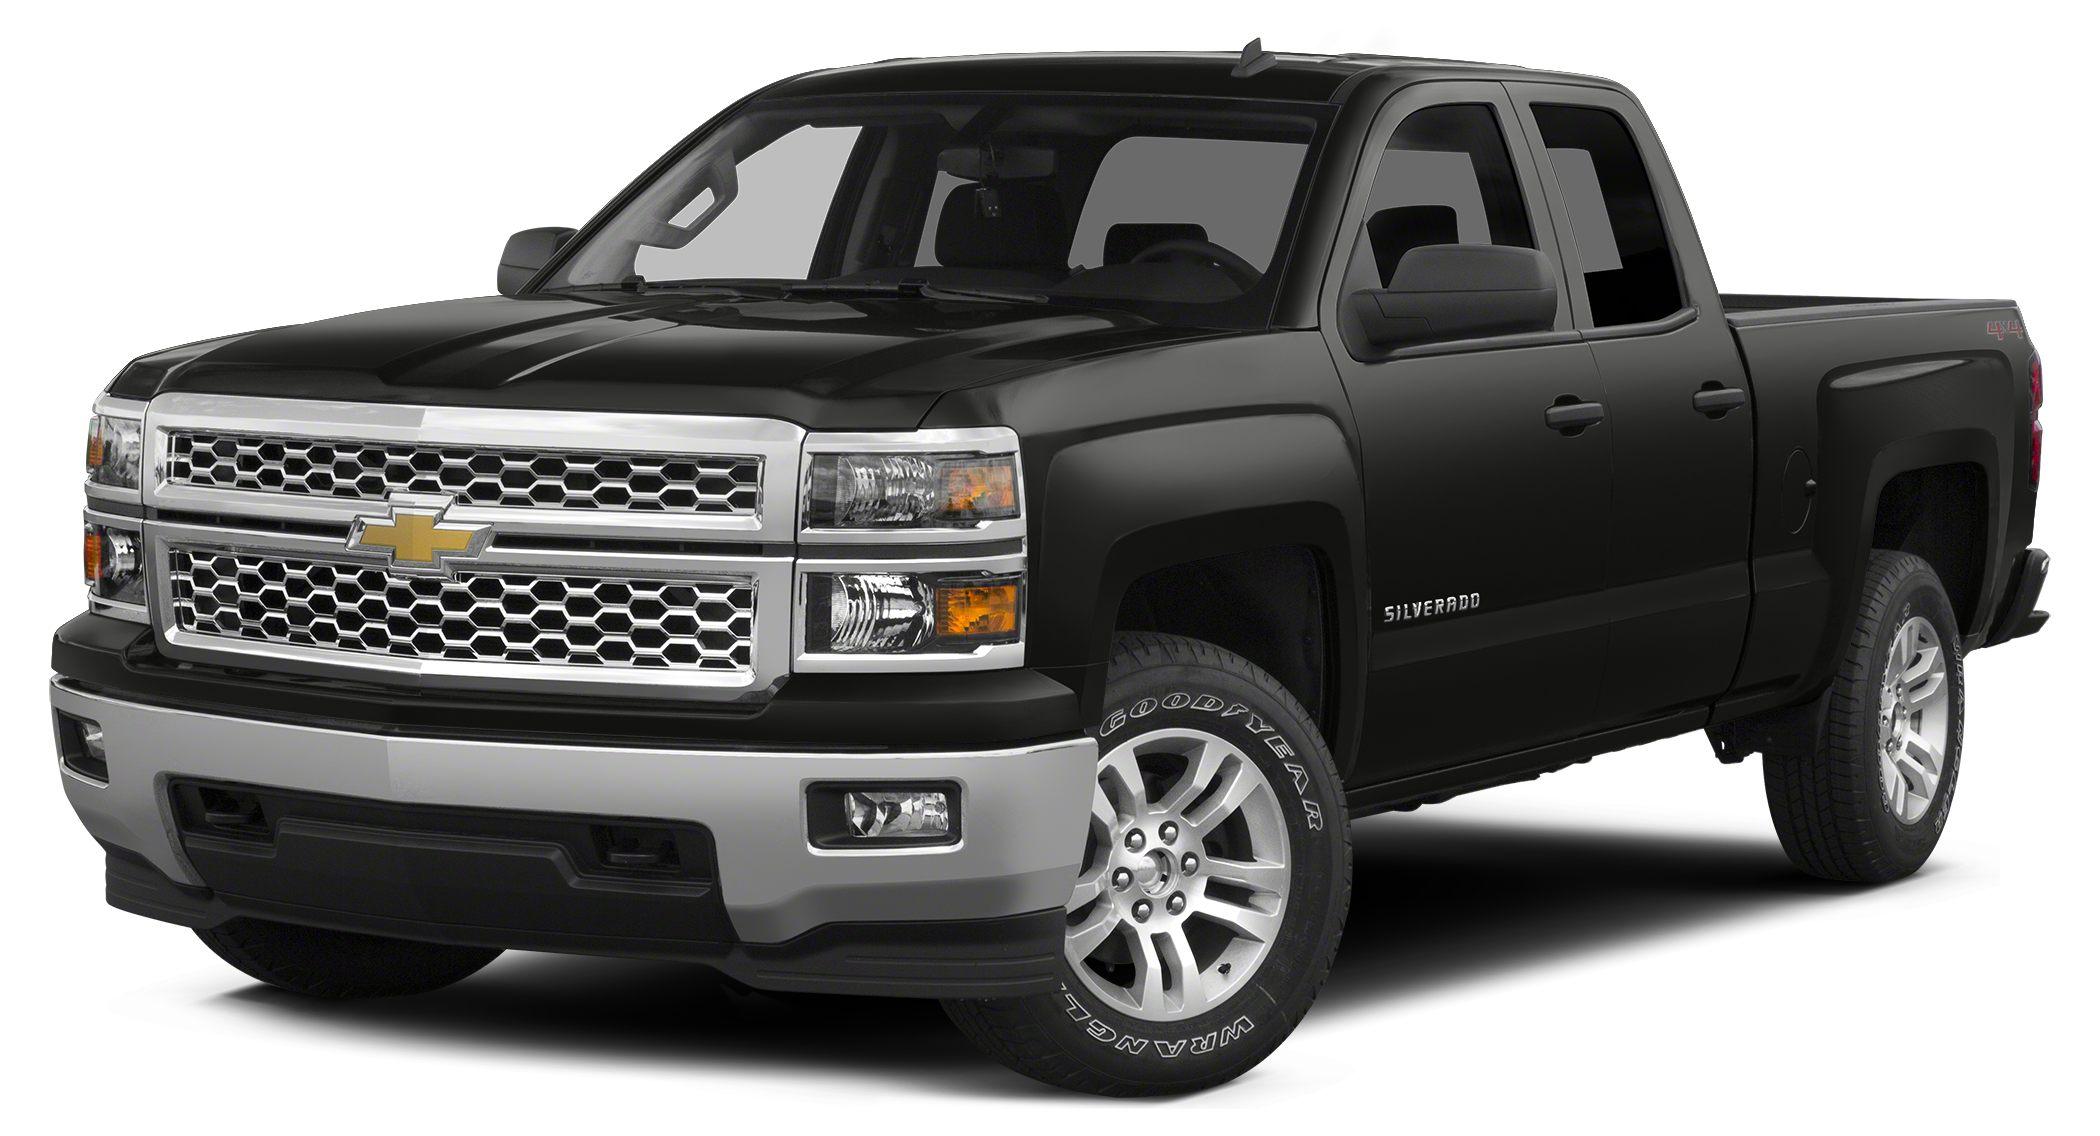 2014 Chevrolet Silverado 1500 WT Clean Carfax - 1 Owner - 4WD - Bluetooth For Phone - Power window